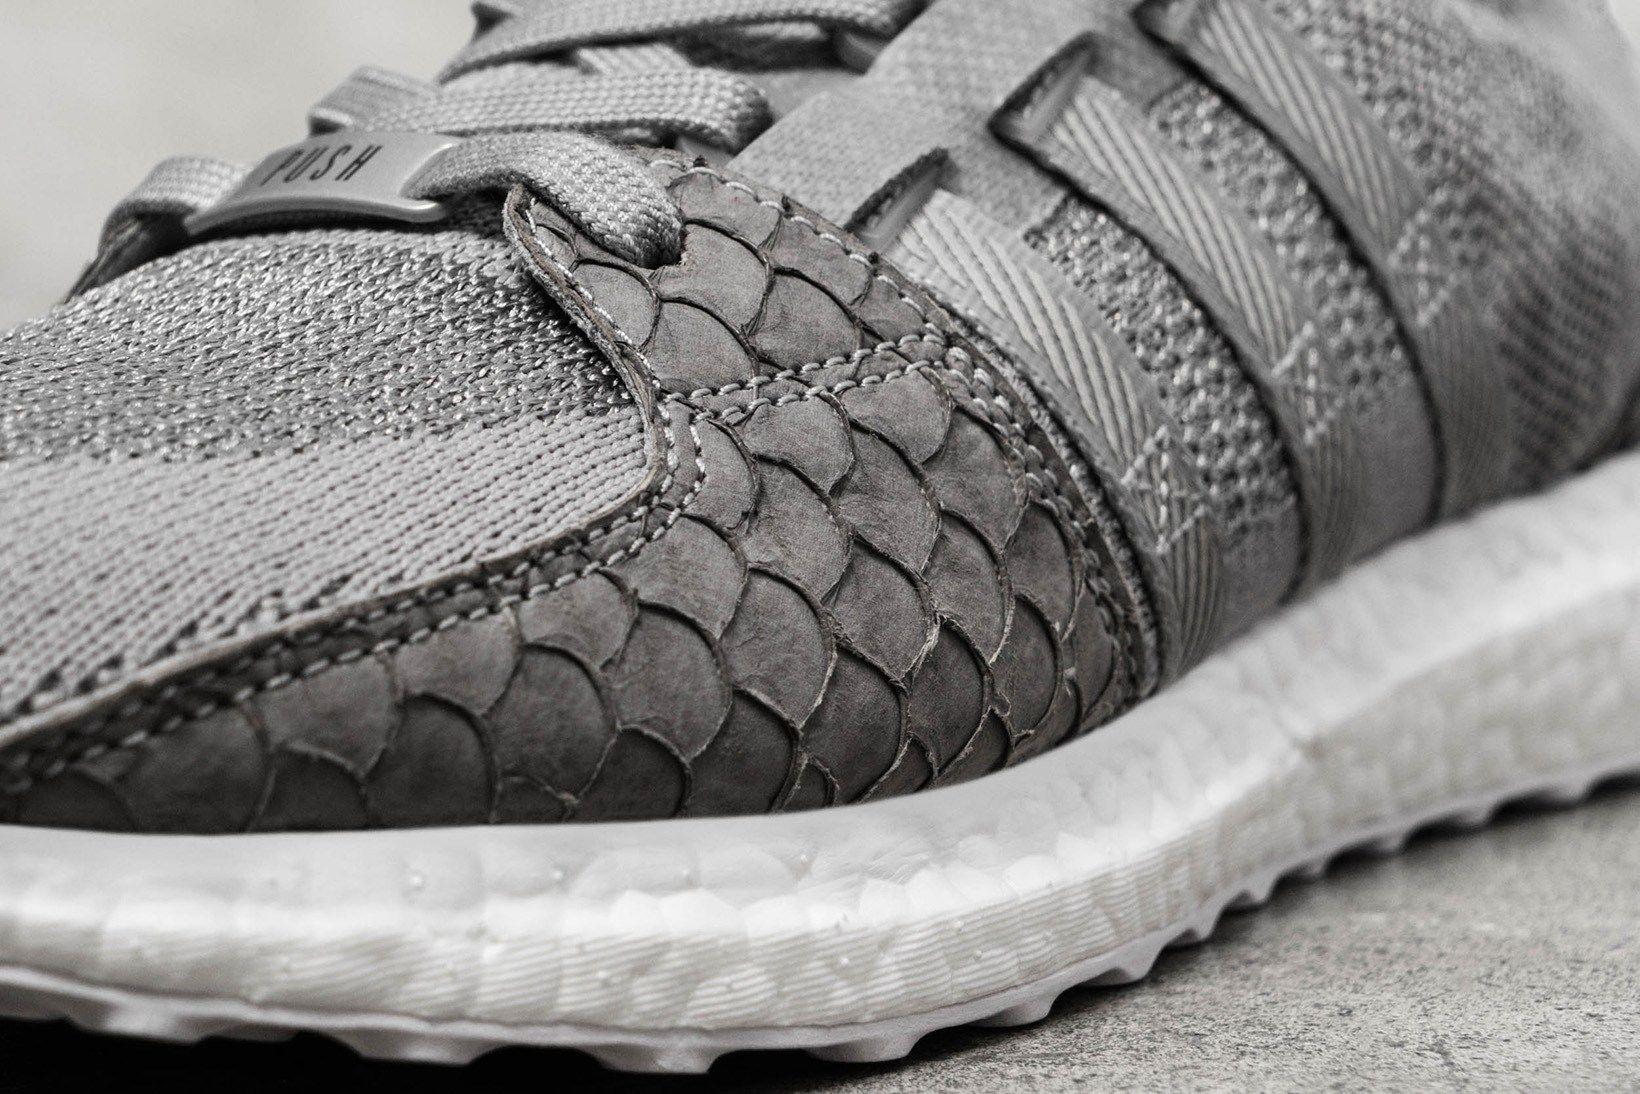 huge selection of 5dd24 b05e5 adidas Originals Officially Reveals Its